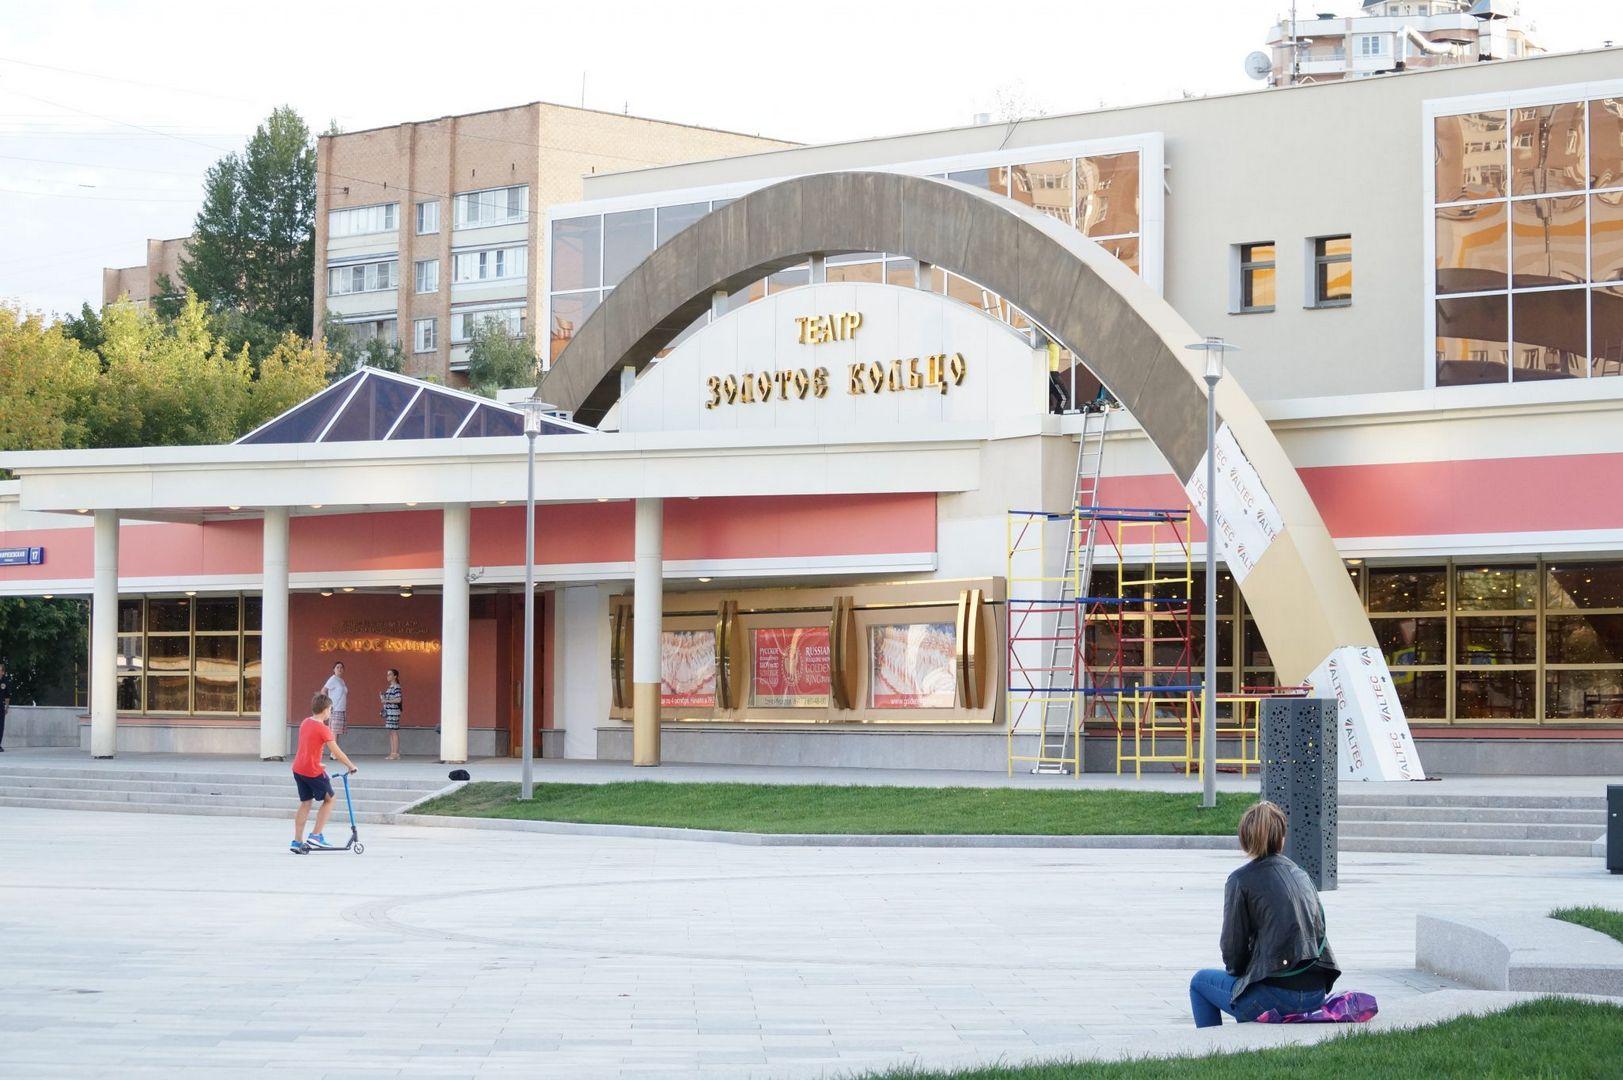 театр Золоток кольцо